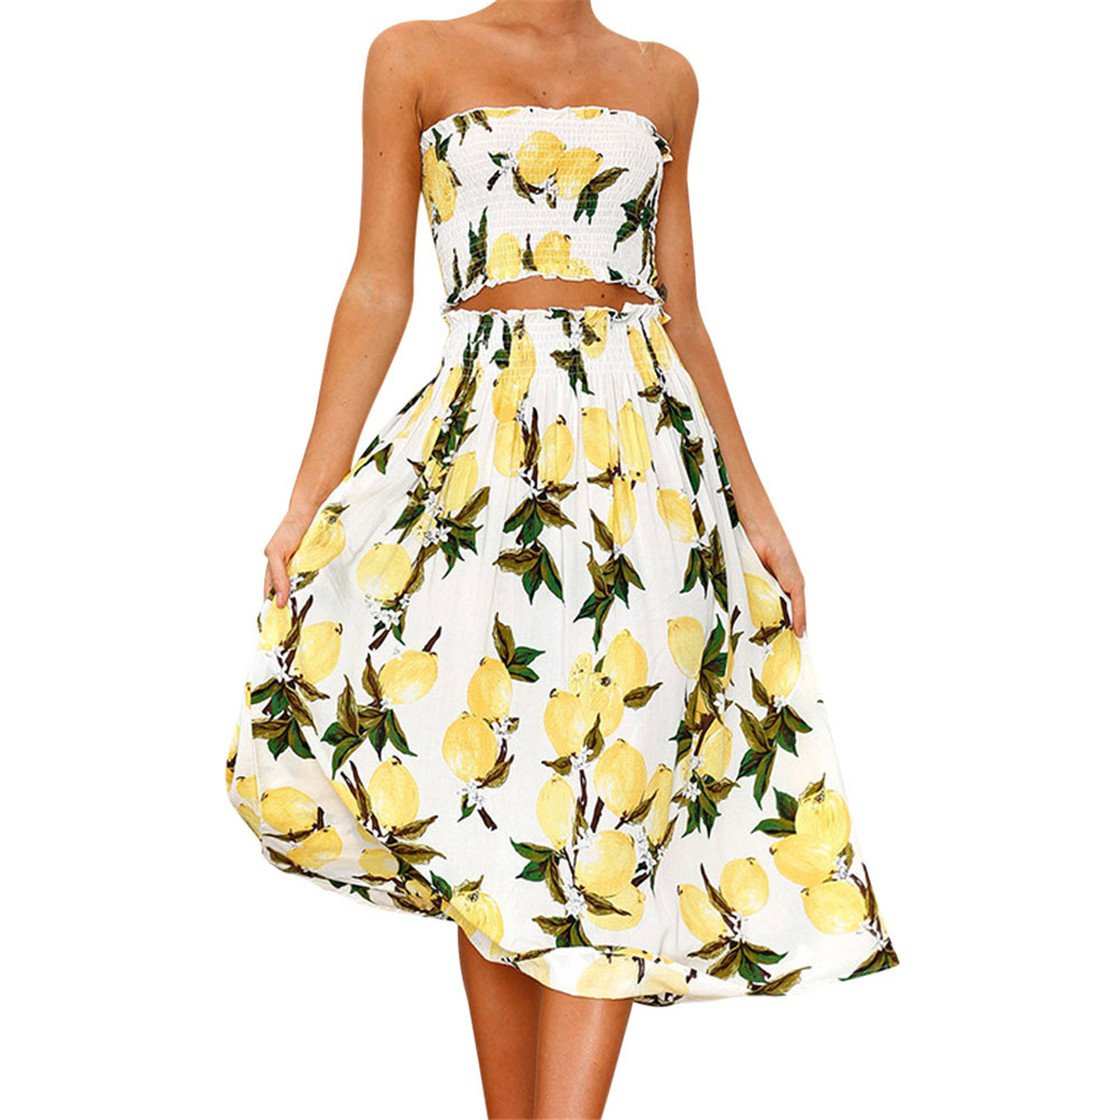 Mose Skirts for Women, Womens Lemon Print Halter Two Piece Slash Neck Tops Casual Elegant Summer Beach Vest Shirt Blouse Set New (Yellow, M)